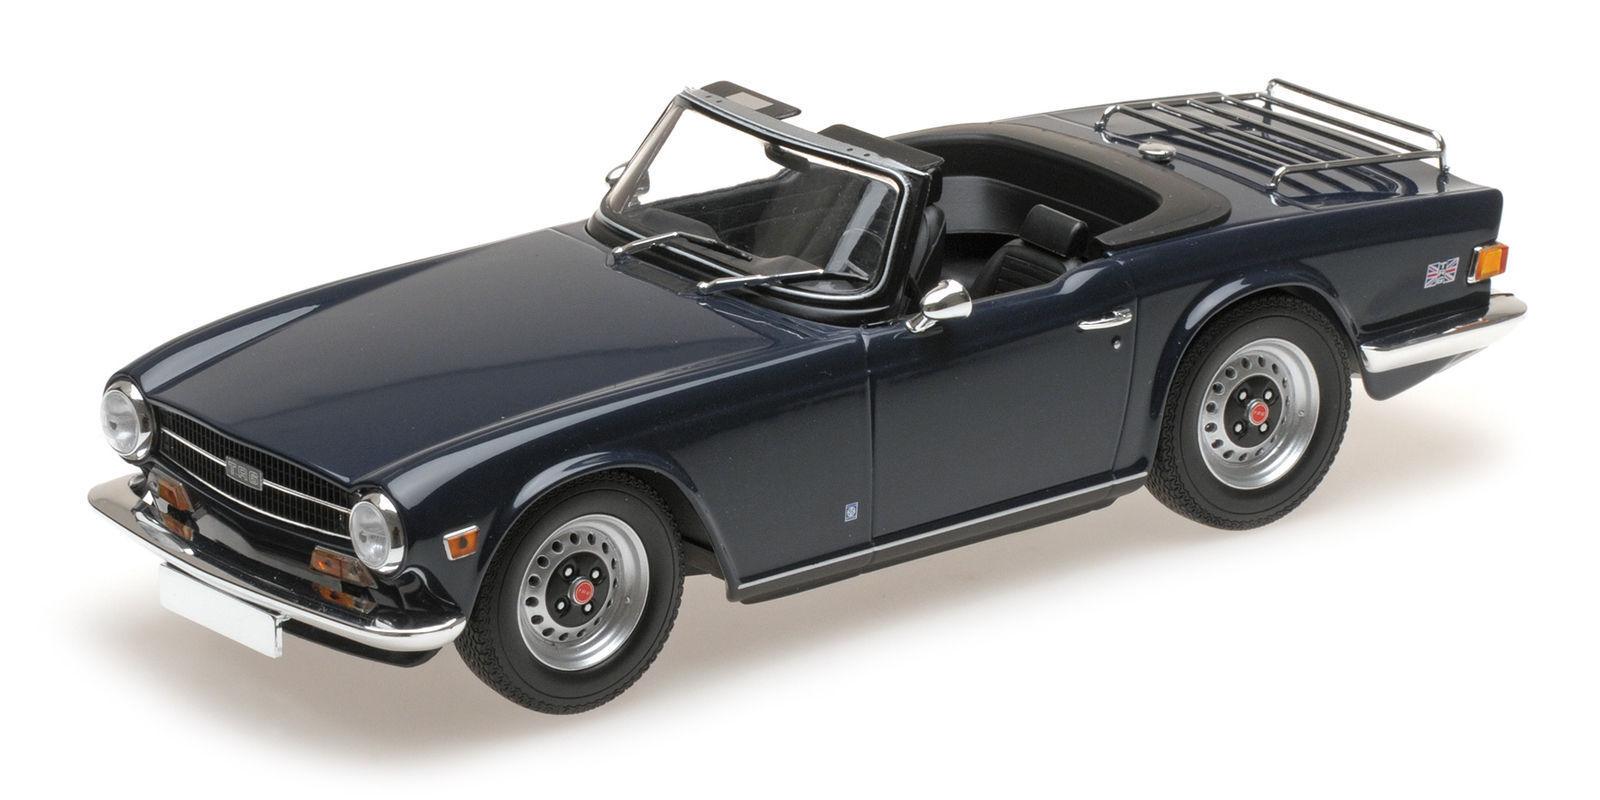 1 18 Minichamps-Triumph tr6 DARK bleu, 1973, Limited Editon 1 V .350